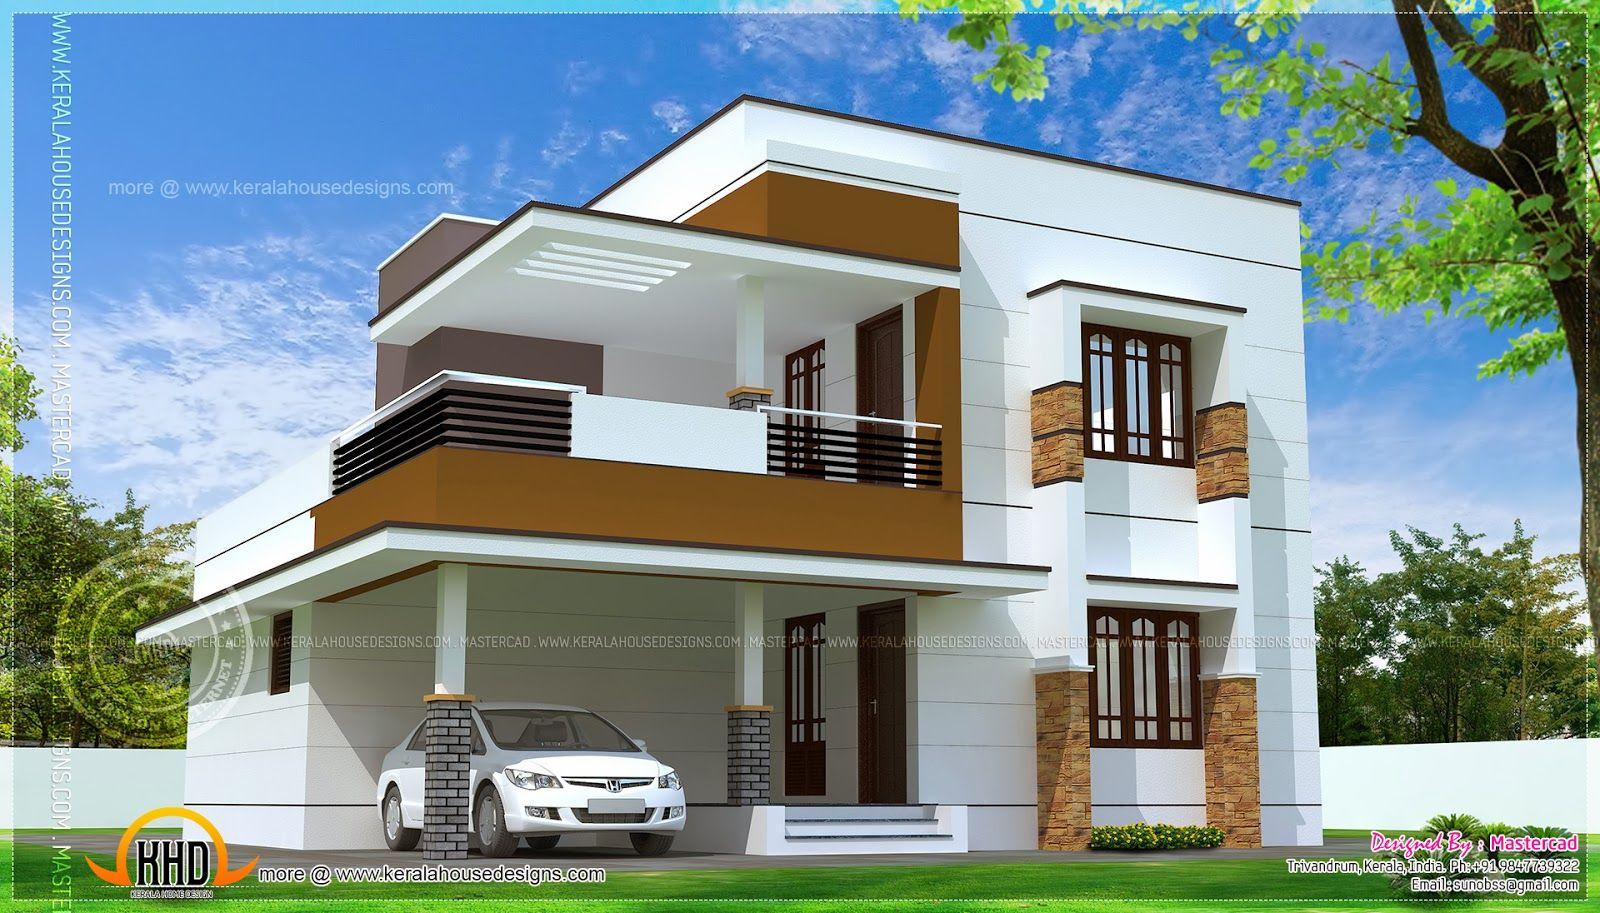 Kerala Home Design And Floor Plans 8000 Houses Kerala House Design Duplex House Design Bungalow House Design